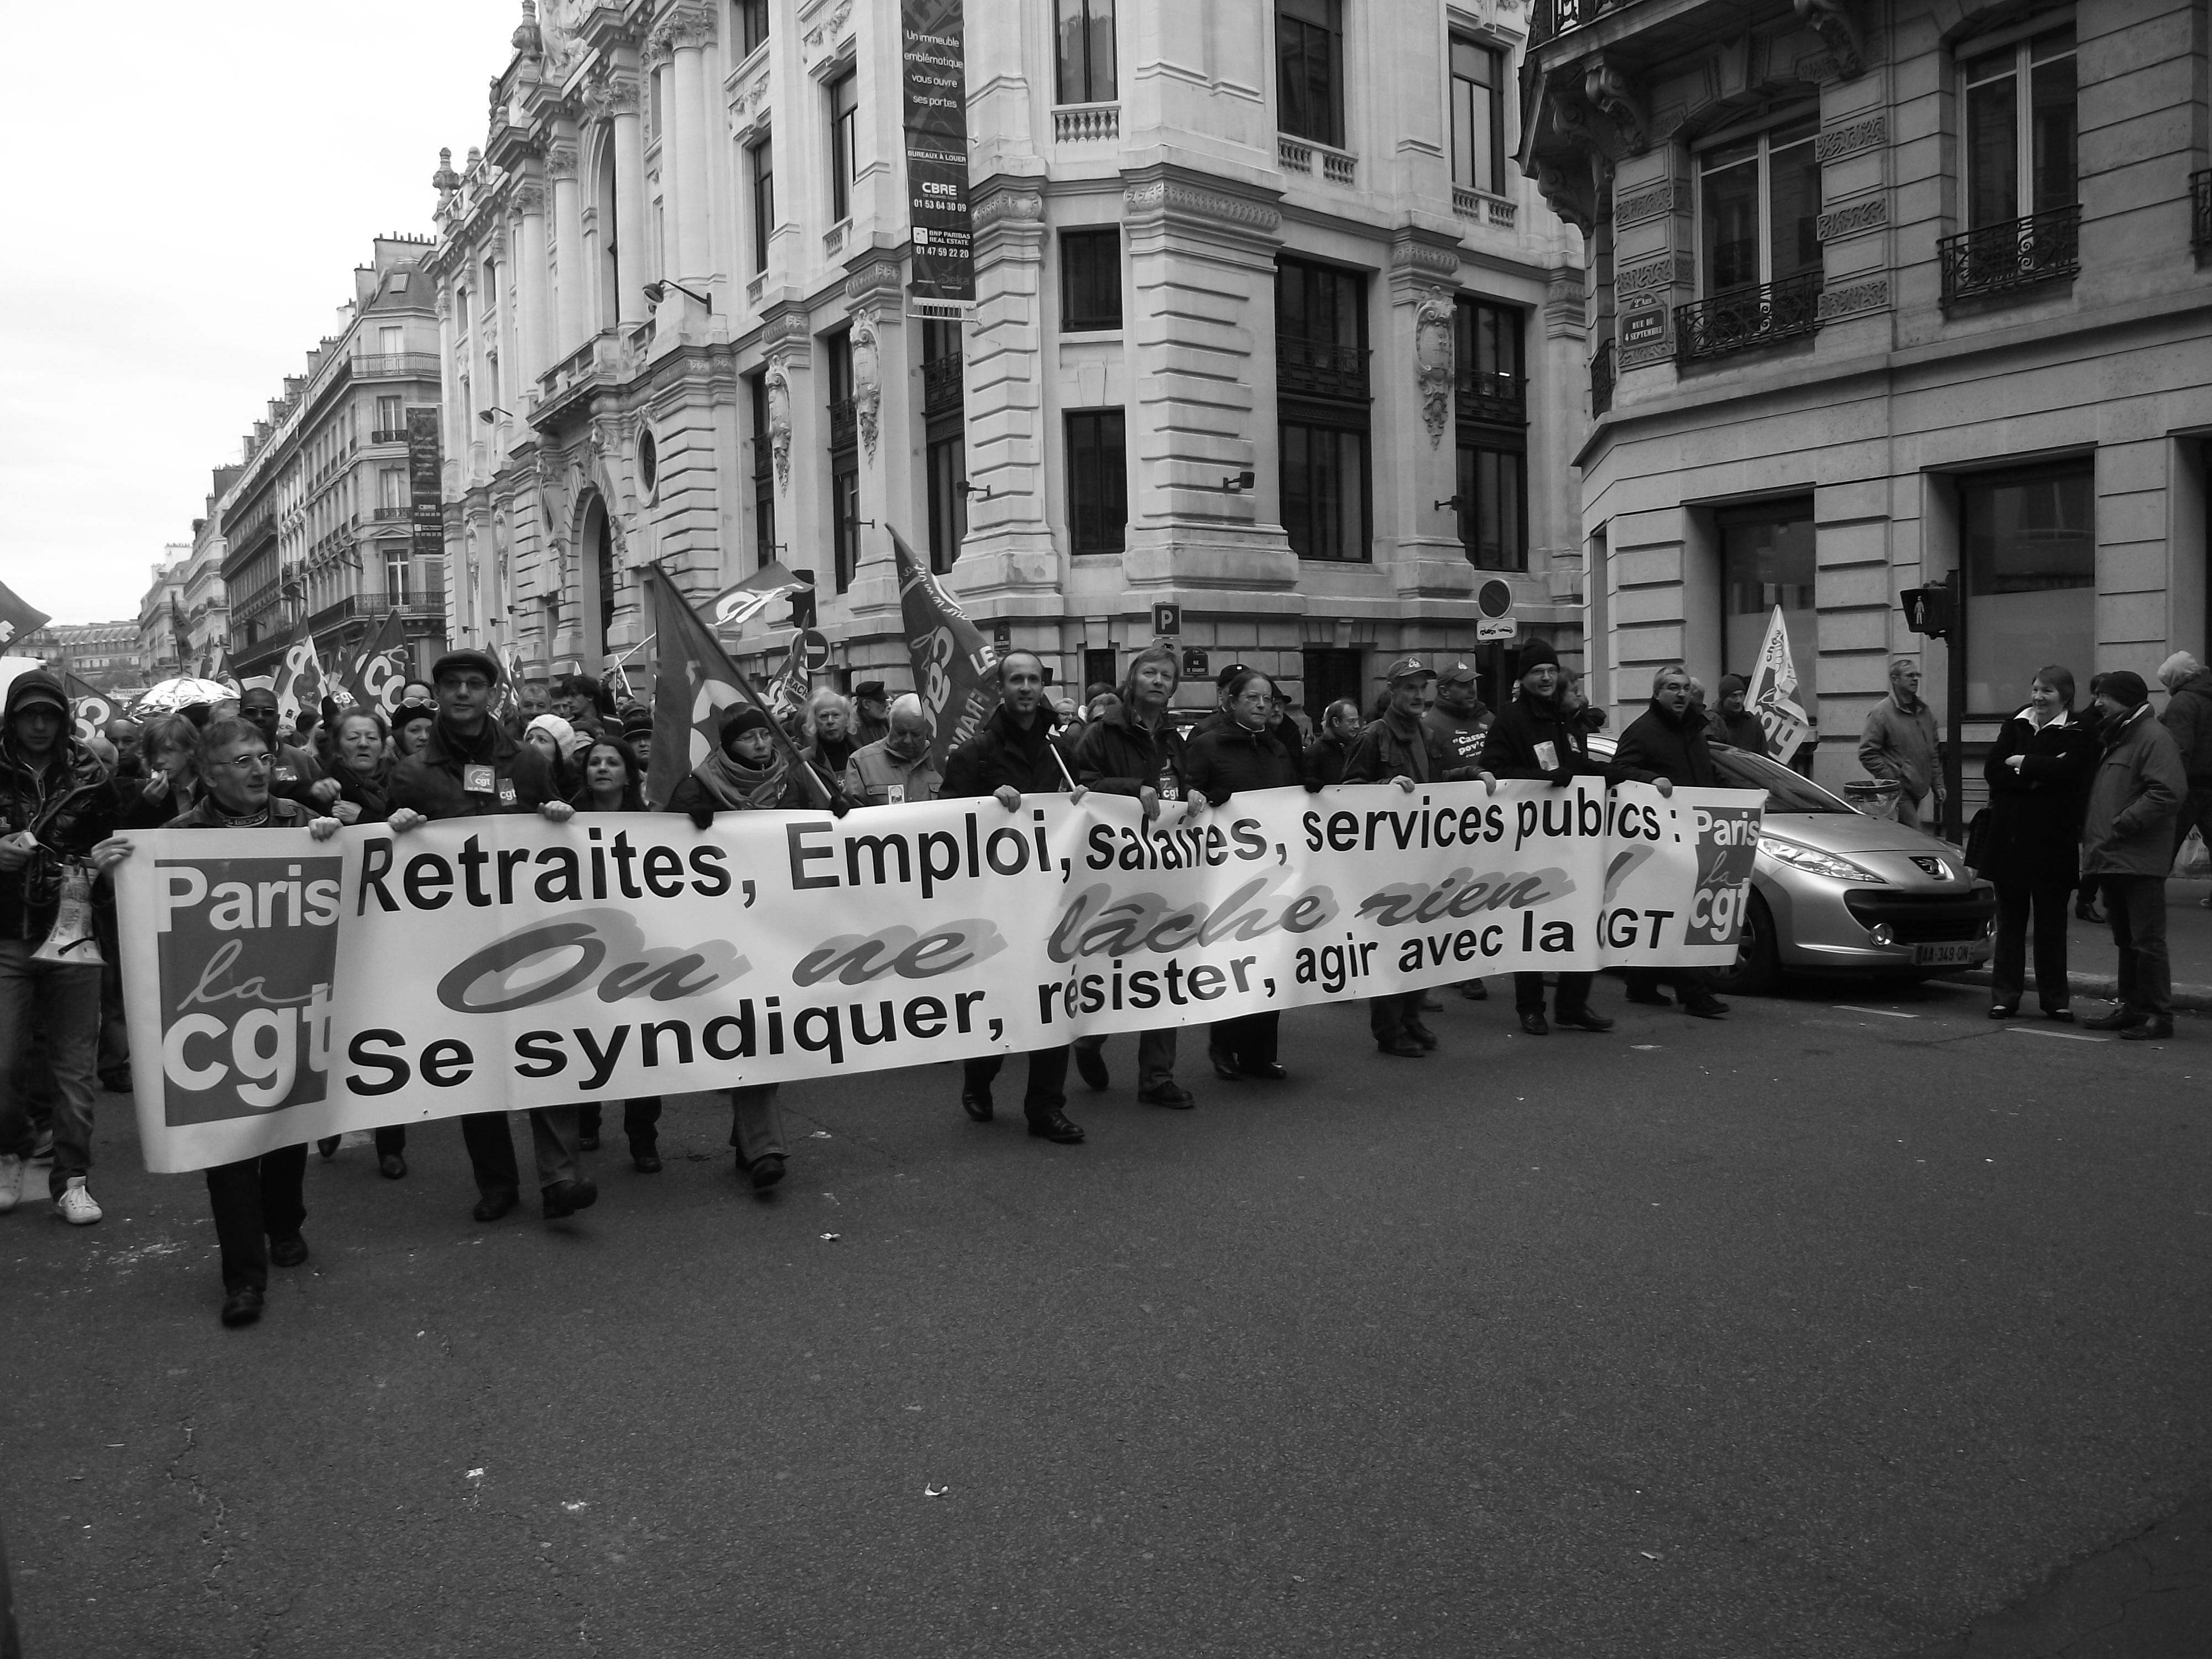 http://idees.rouges.cowblog.fr/images/SuperBigCoco/DSCF0828.jpg